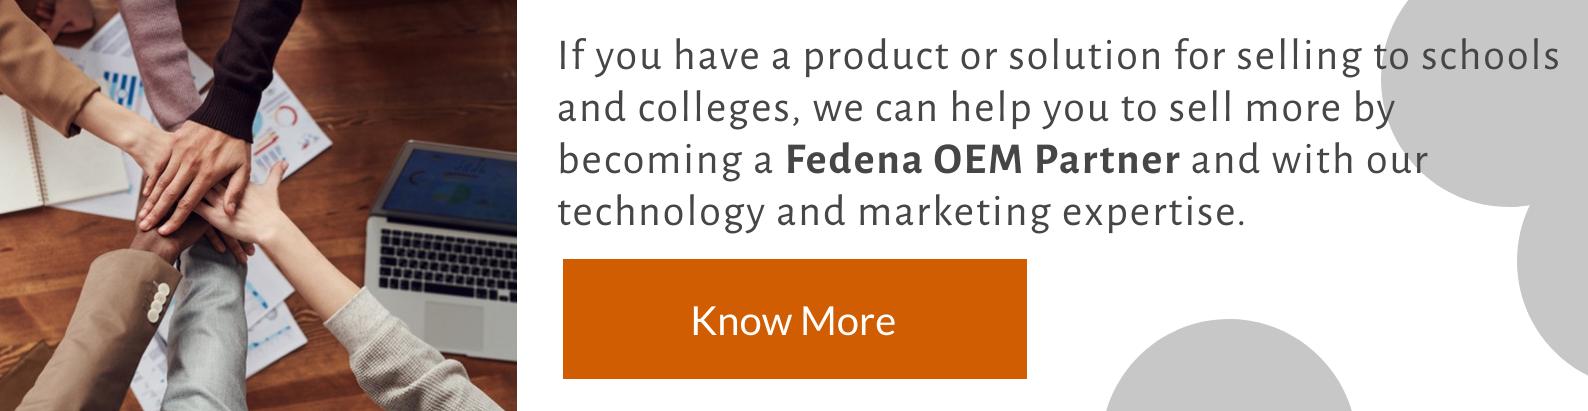 Fedena OEM Partner